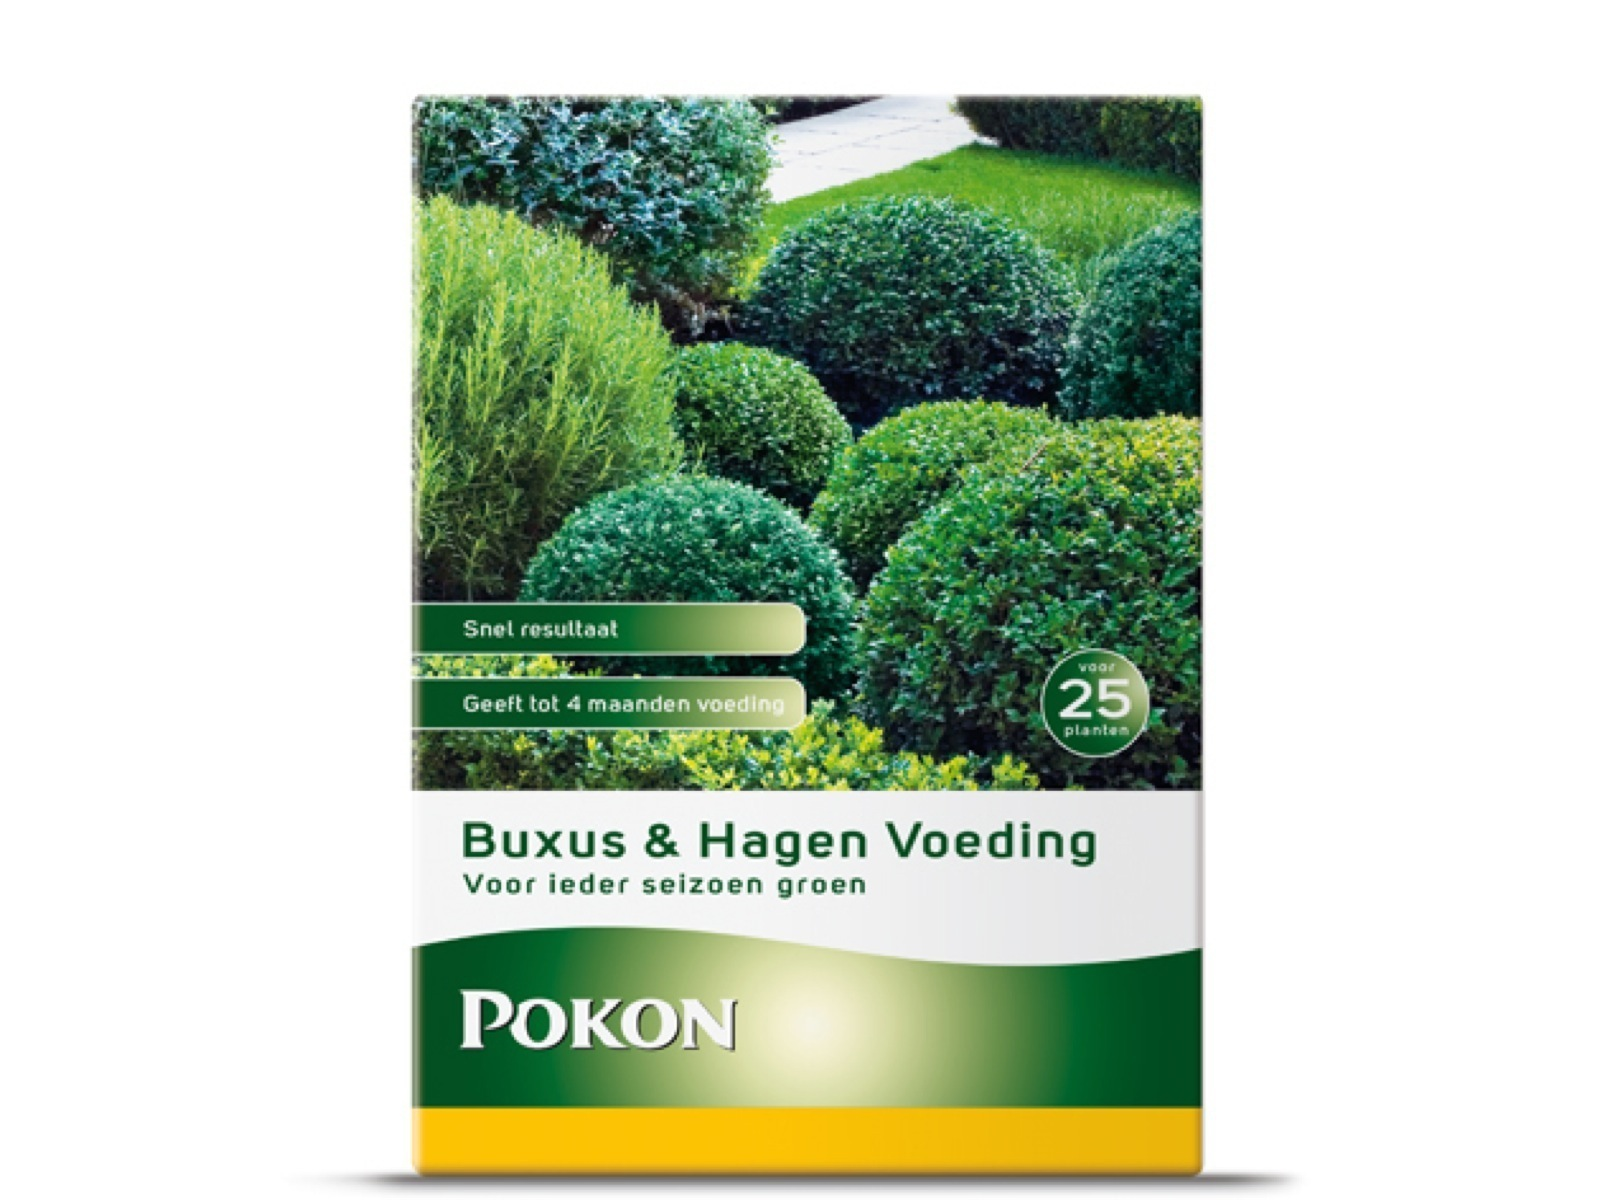 Pok. buxus & hagen voeding 800 g